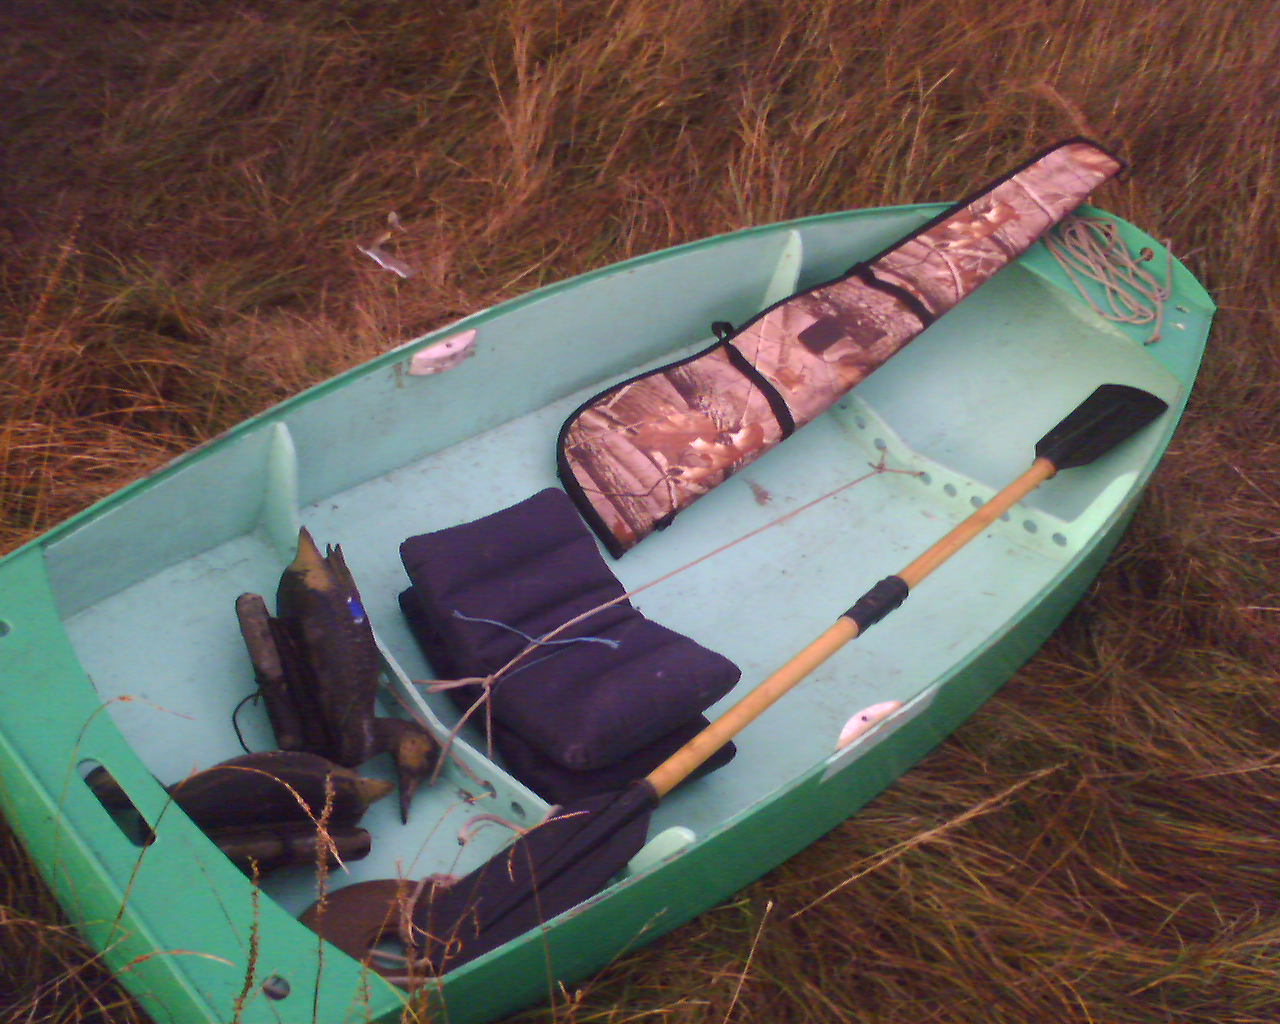 видео лодка для рыбалки своими руками